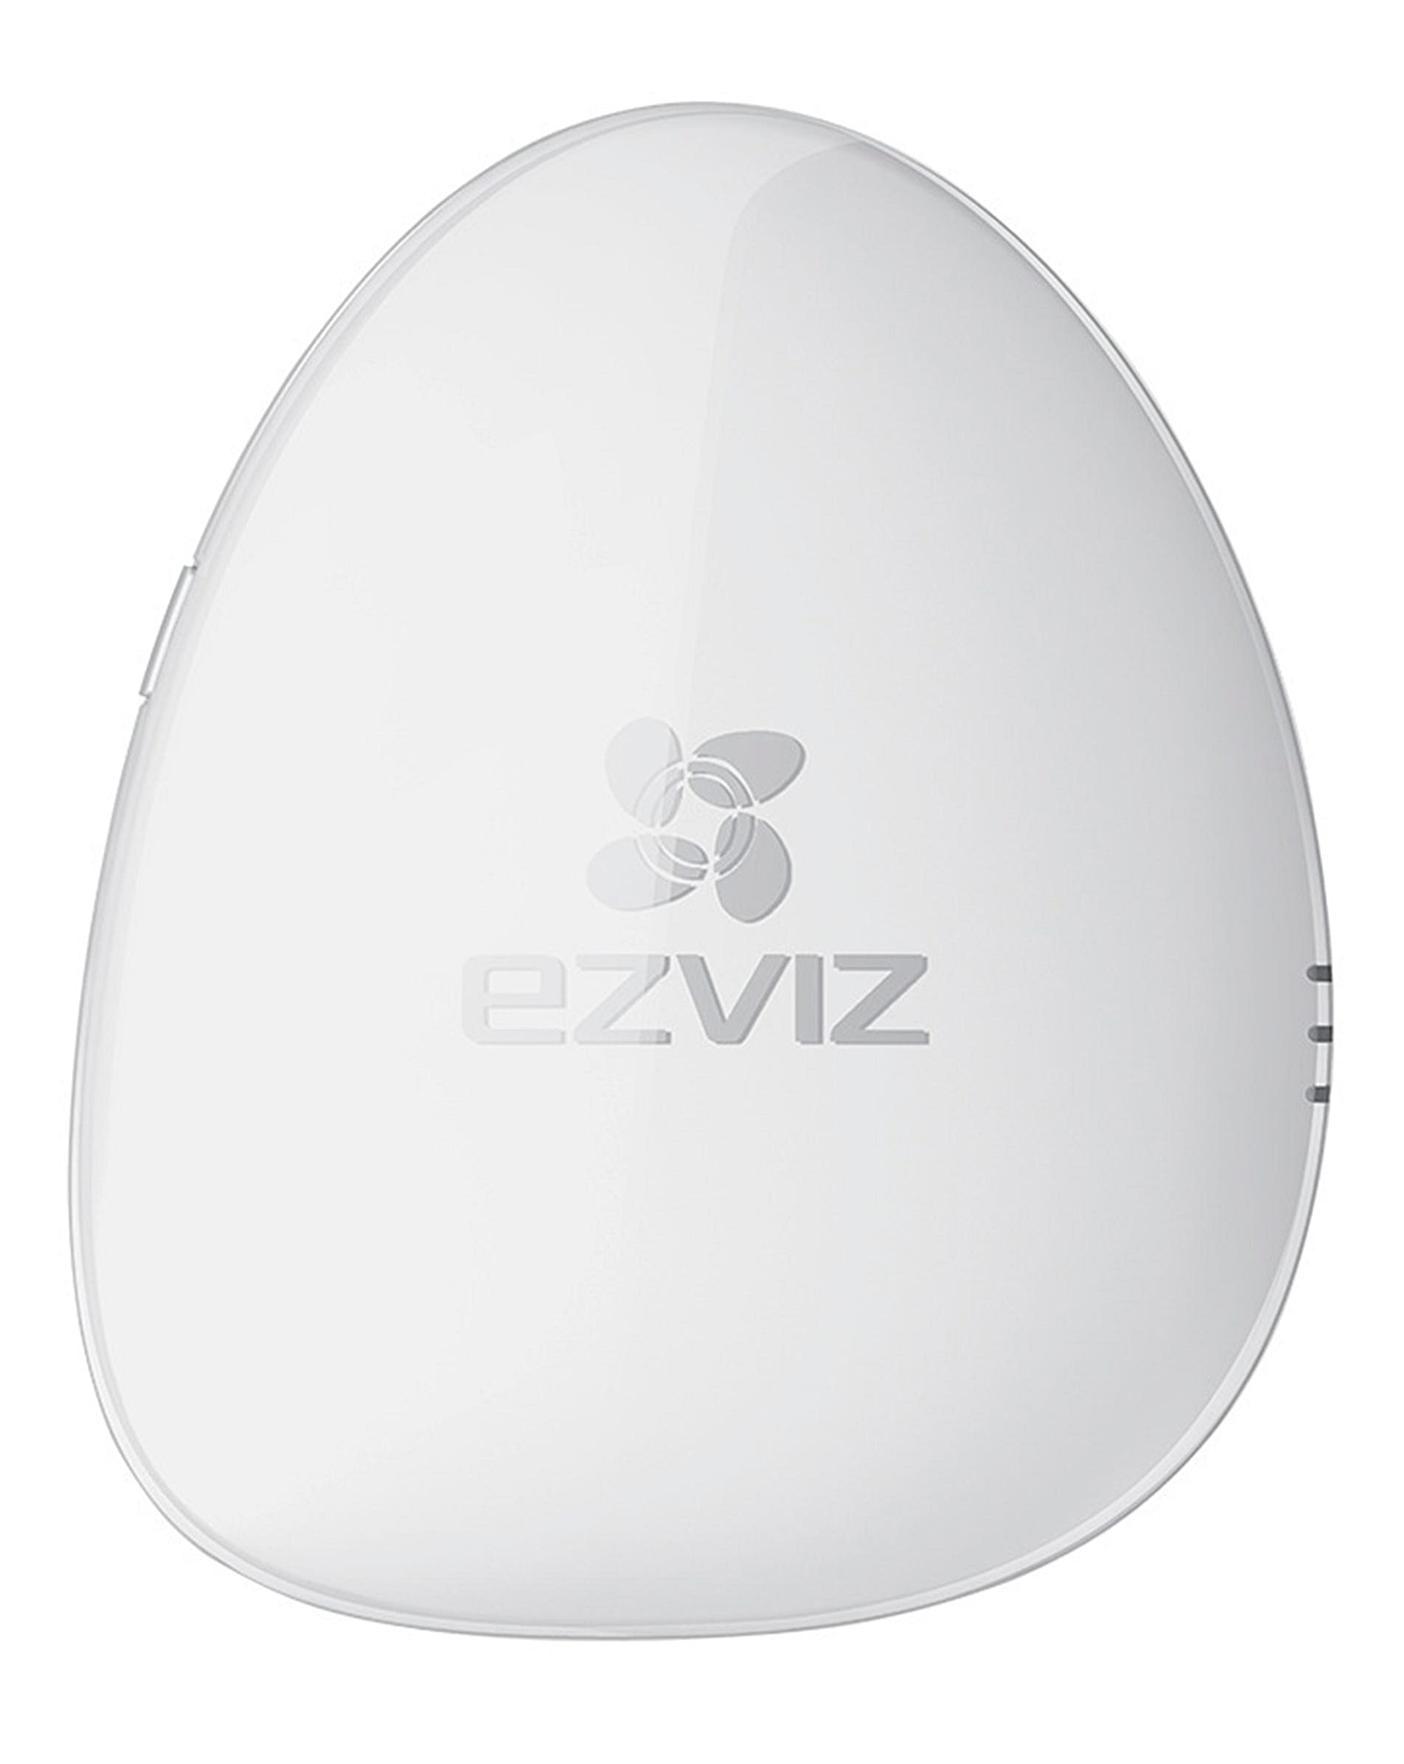 EZVIZ ezAlert Wireless Smart Home Alarm Hub with ezAlert Remote, works with IFTTT (UK SPEC)